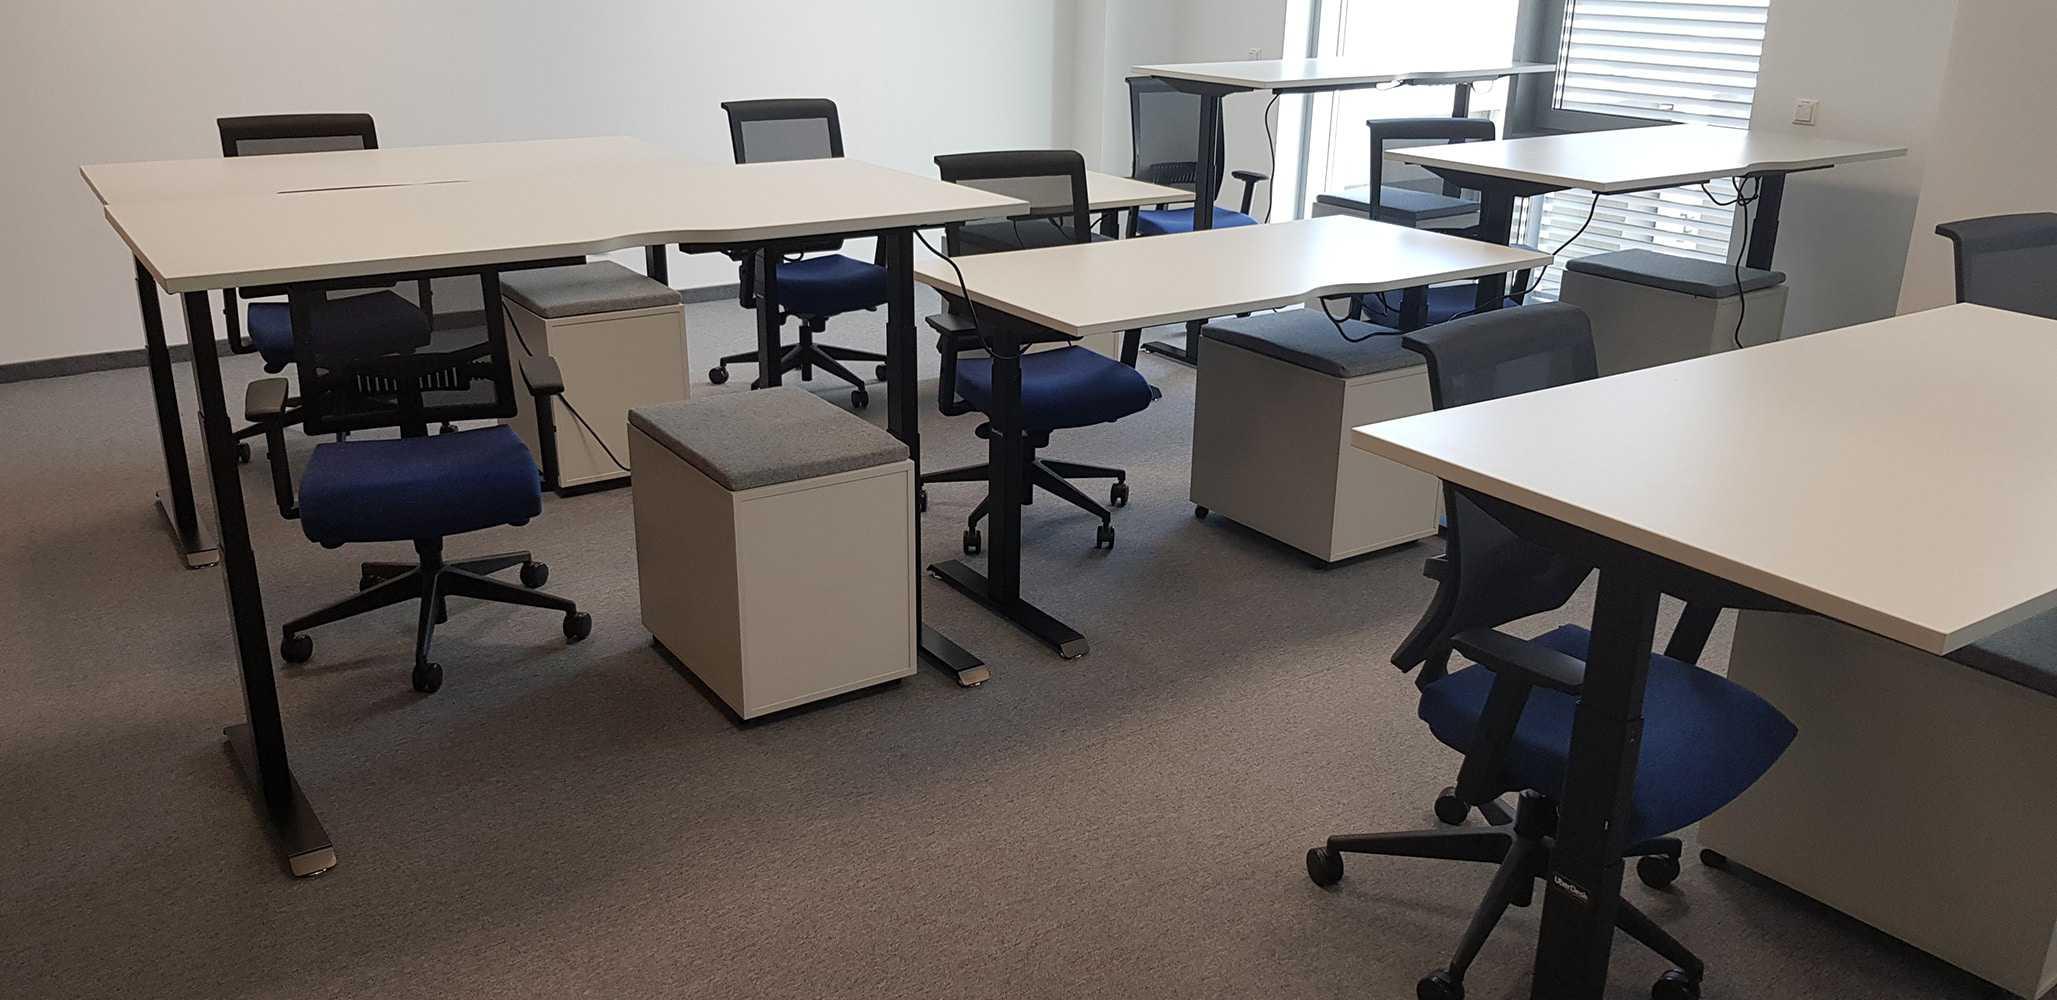 Ergonomic office furniture by BulDesk